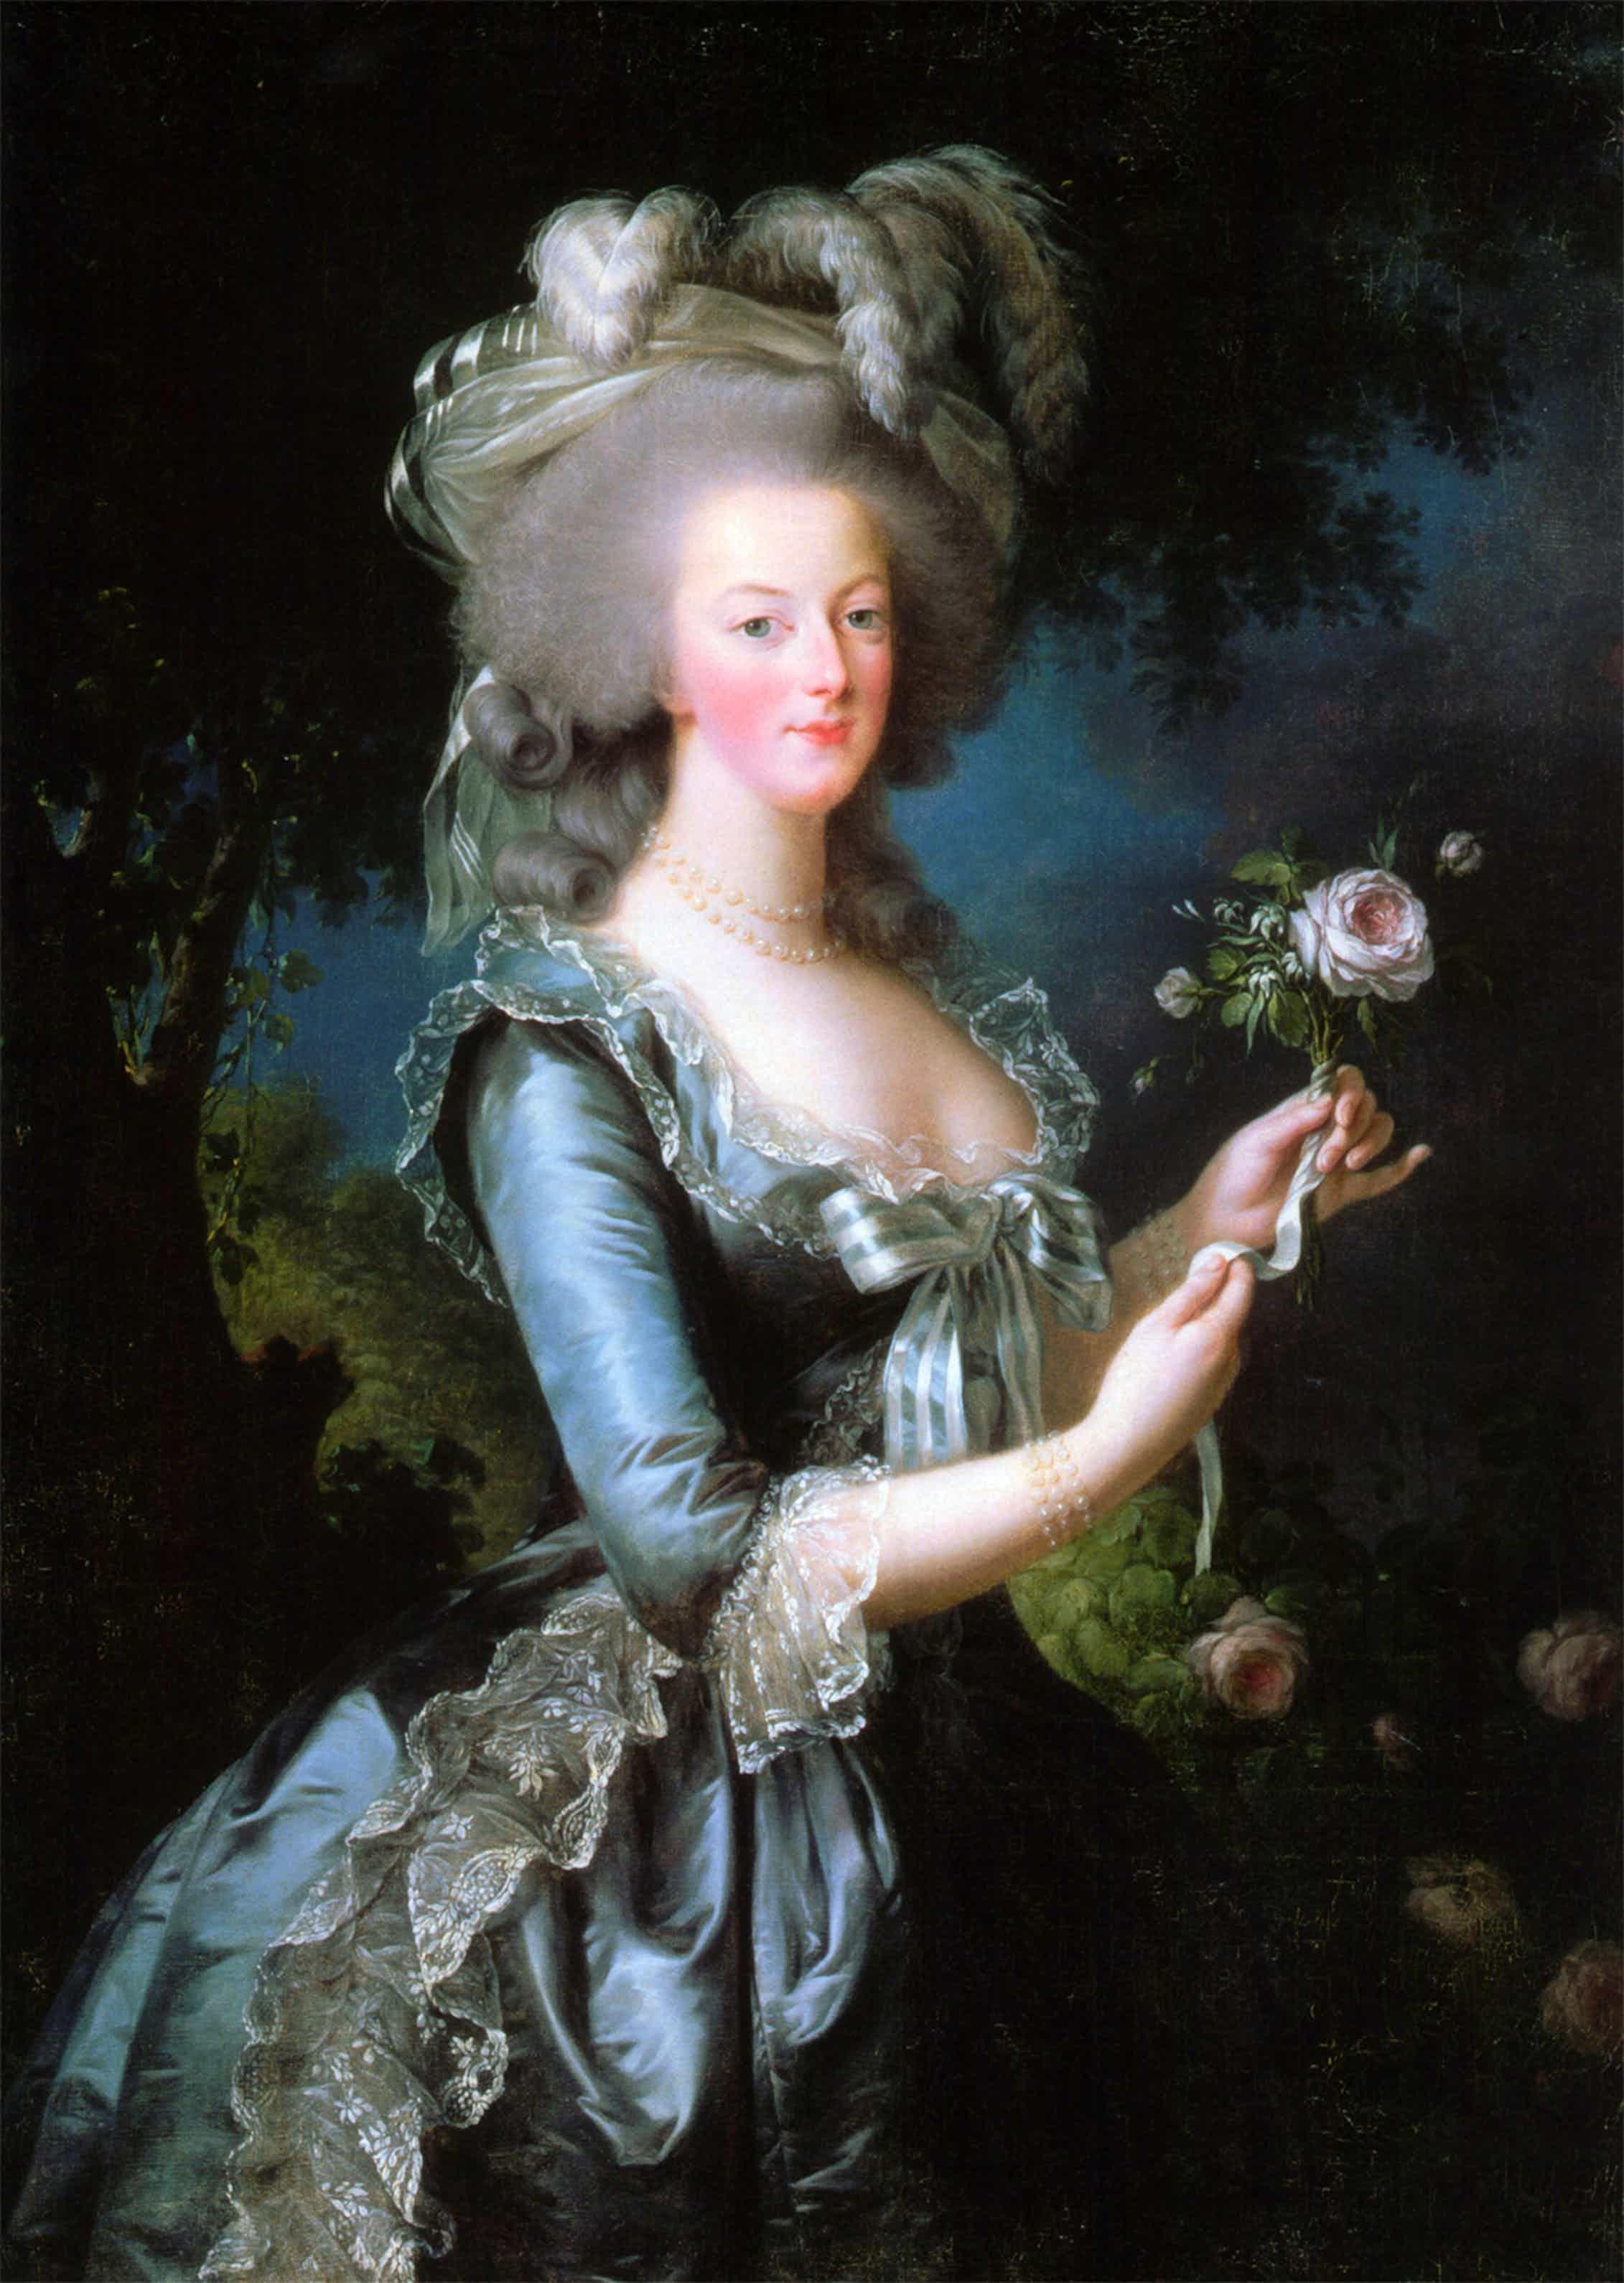 Maria Antonieta retratada por Élisabeth Louise Vigée Le Brun en 1783.Wikimedia Commons